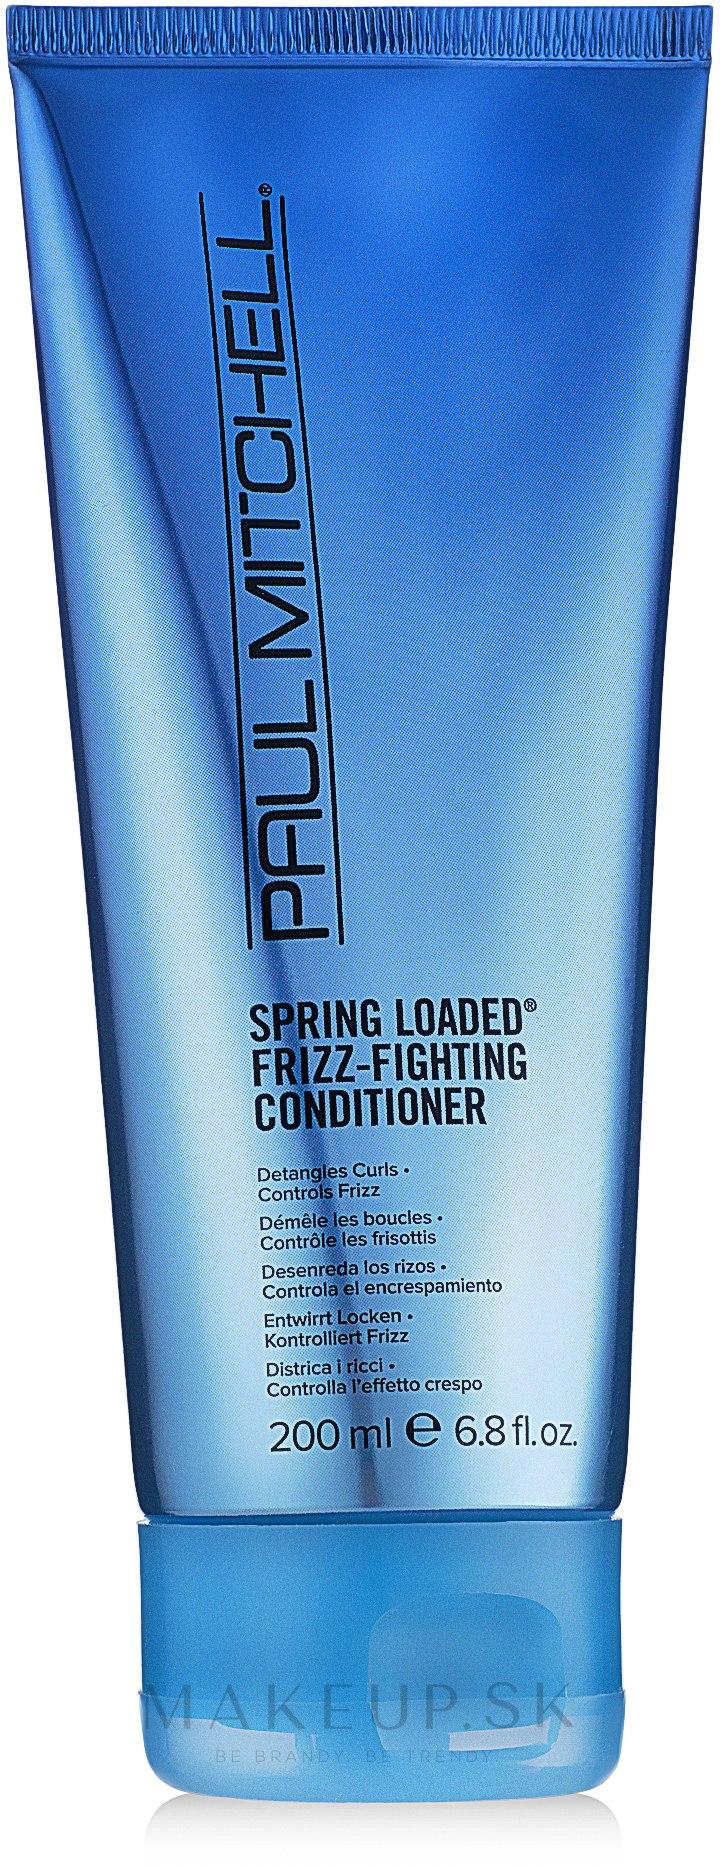 Kondicionér na kučeravé vlasy - Paul Mitchell Curls Spring Loaded Frizz Fighting Conditioner — Obrázky 200 ml